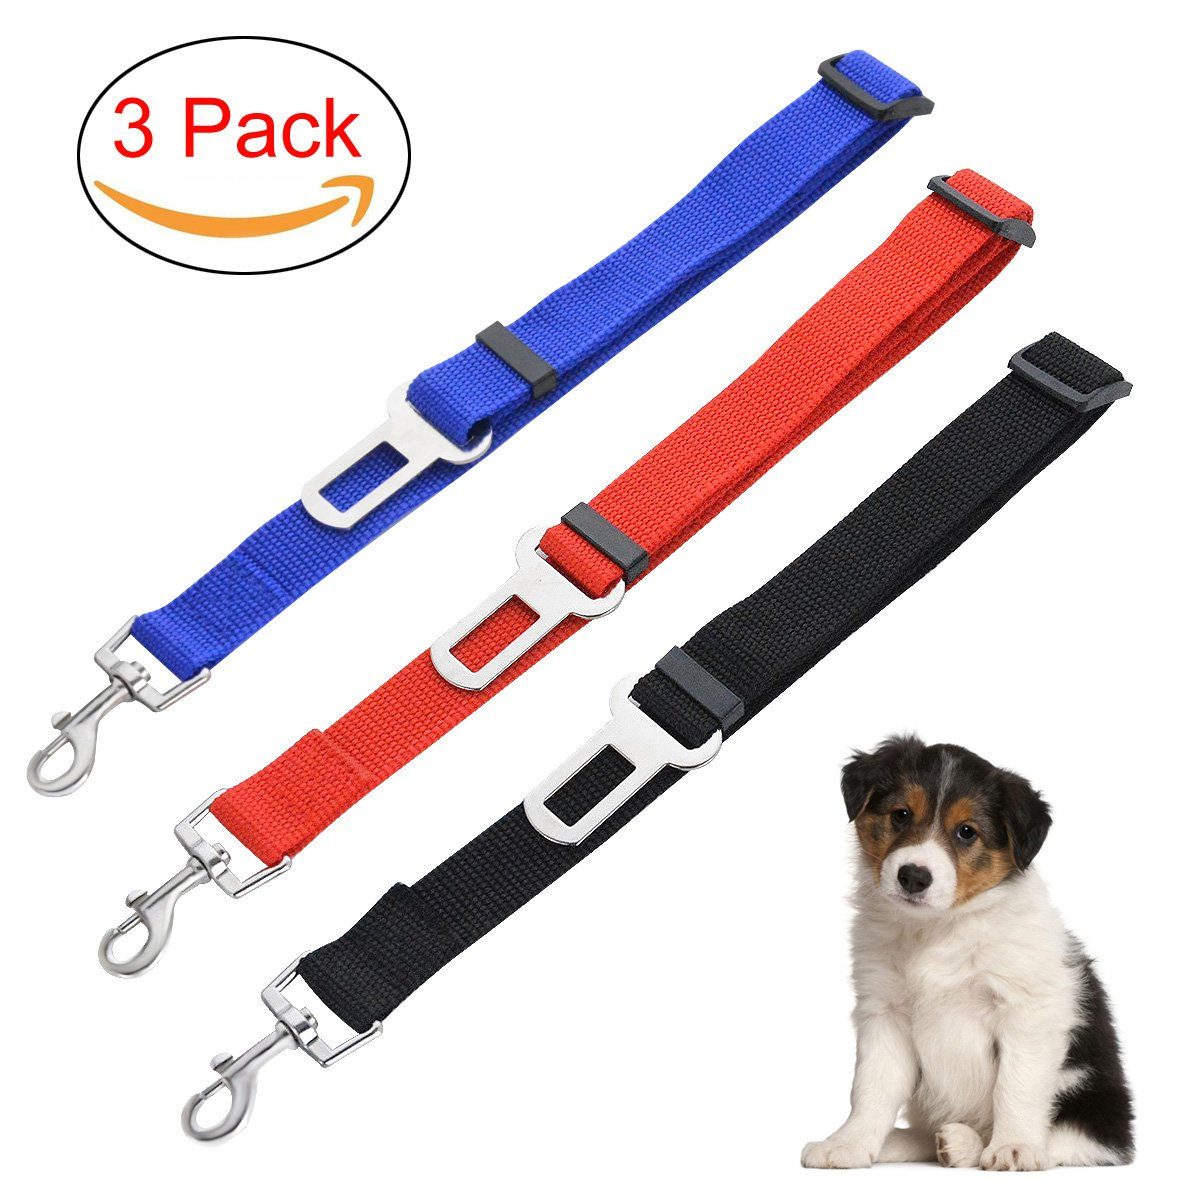 Dog Seatbelt By Guardians Adjustable Pet Car Safety Seat Belt Nylon Material Dogs Harness Lead Leash Vehicle Seatbelts, Set of 3